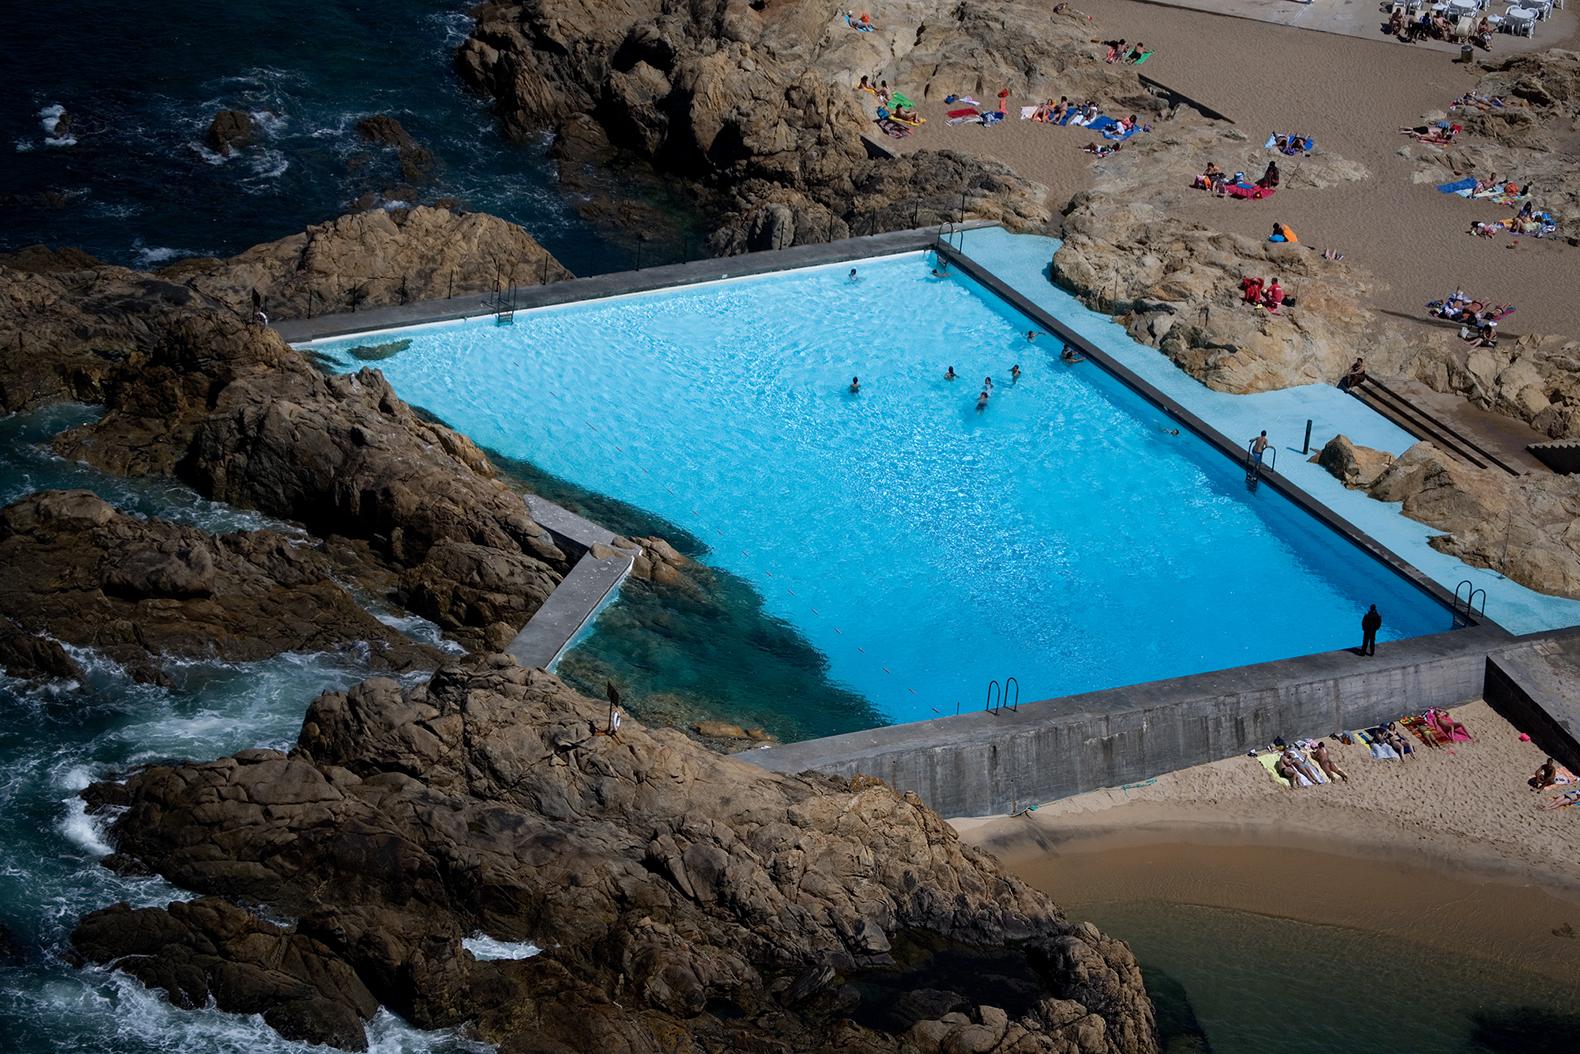 The Siza's Pools das Marés turn 50! | METALOCUS